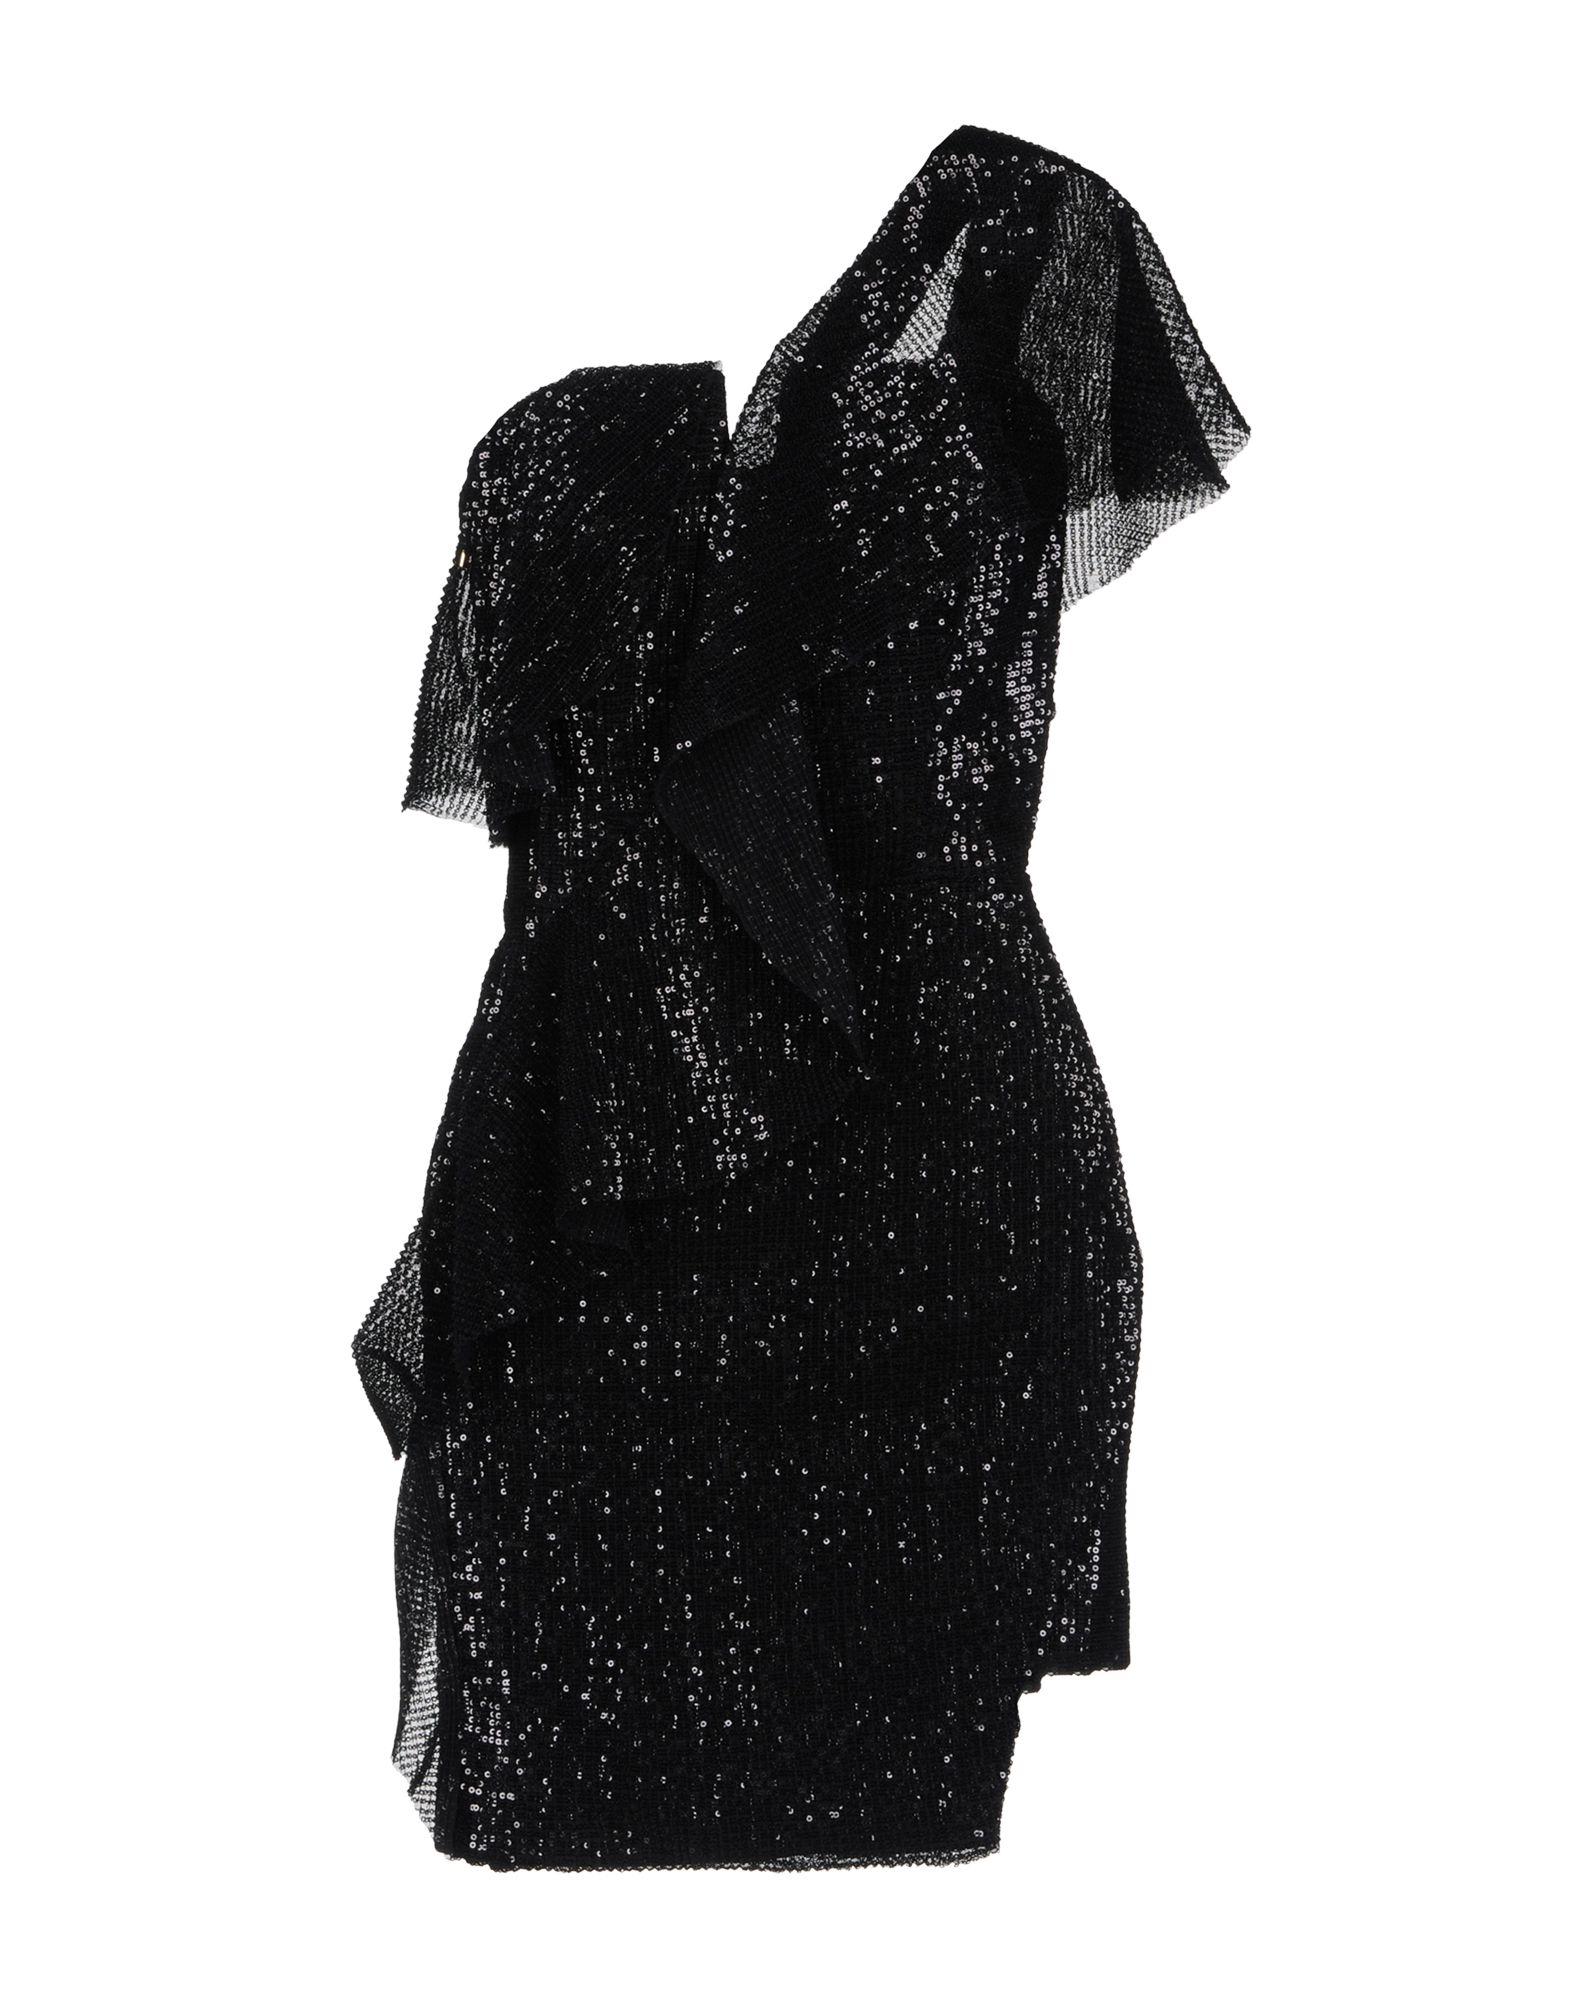 LAMANIA Короткое платье lamania lamania la002ewgwz57 page 1